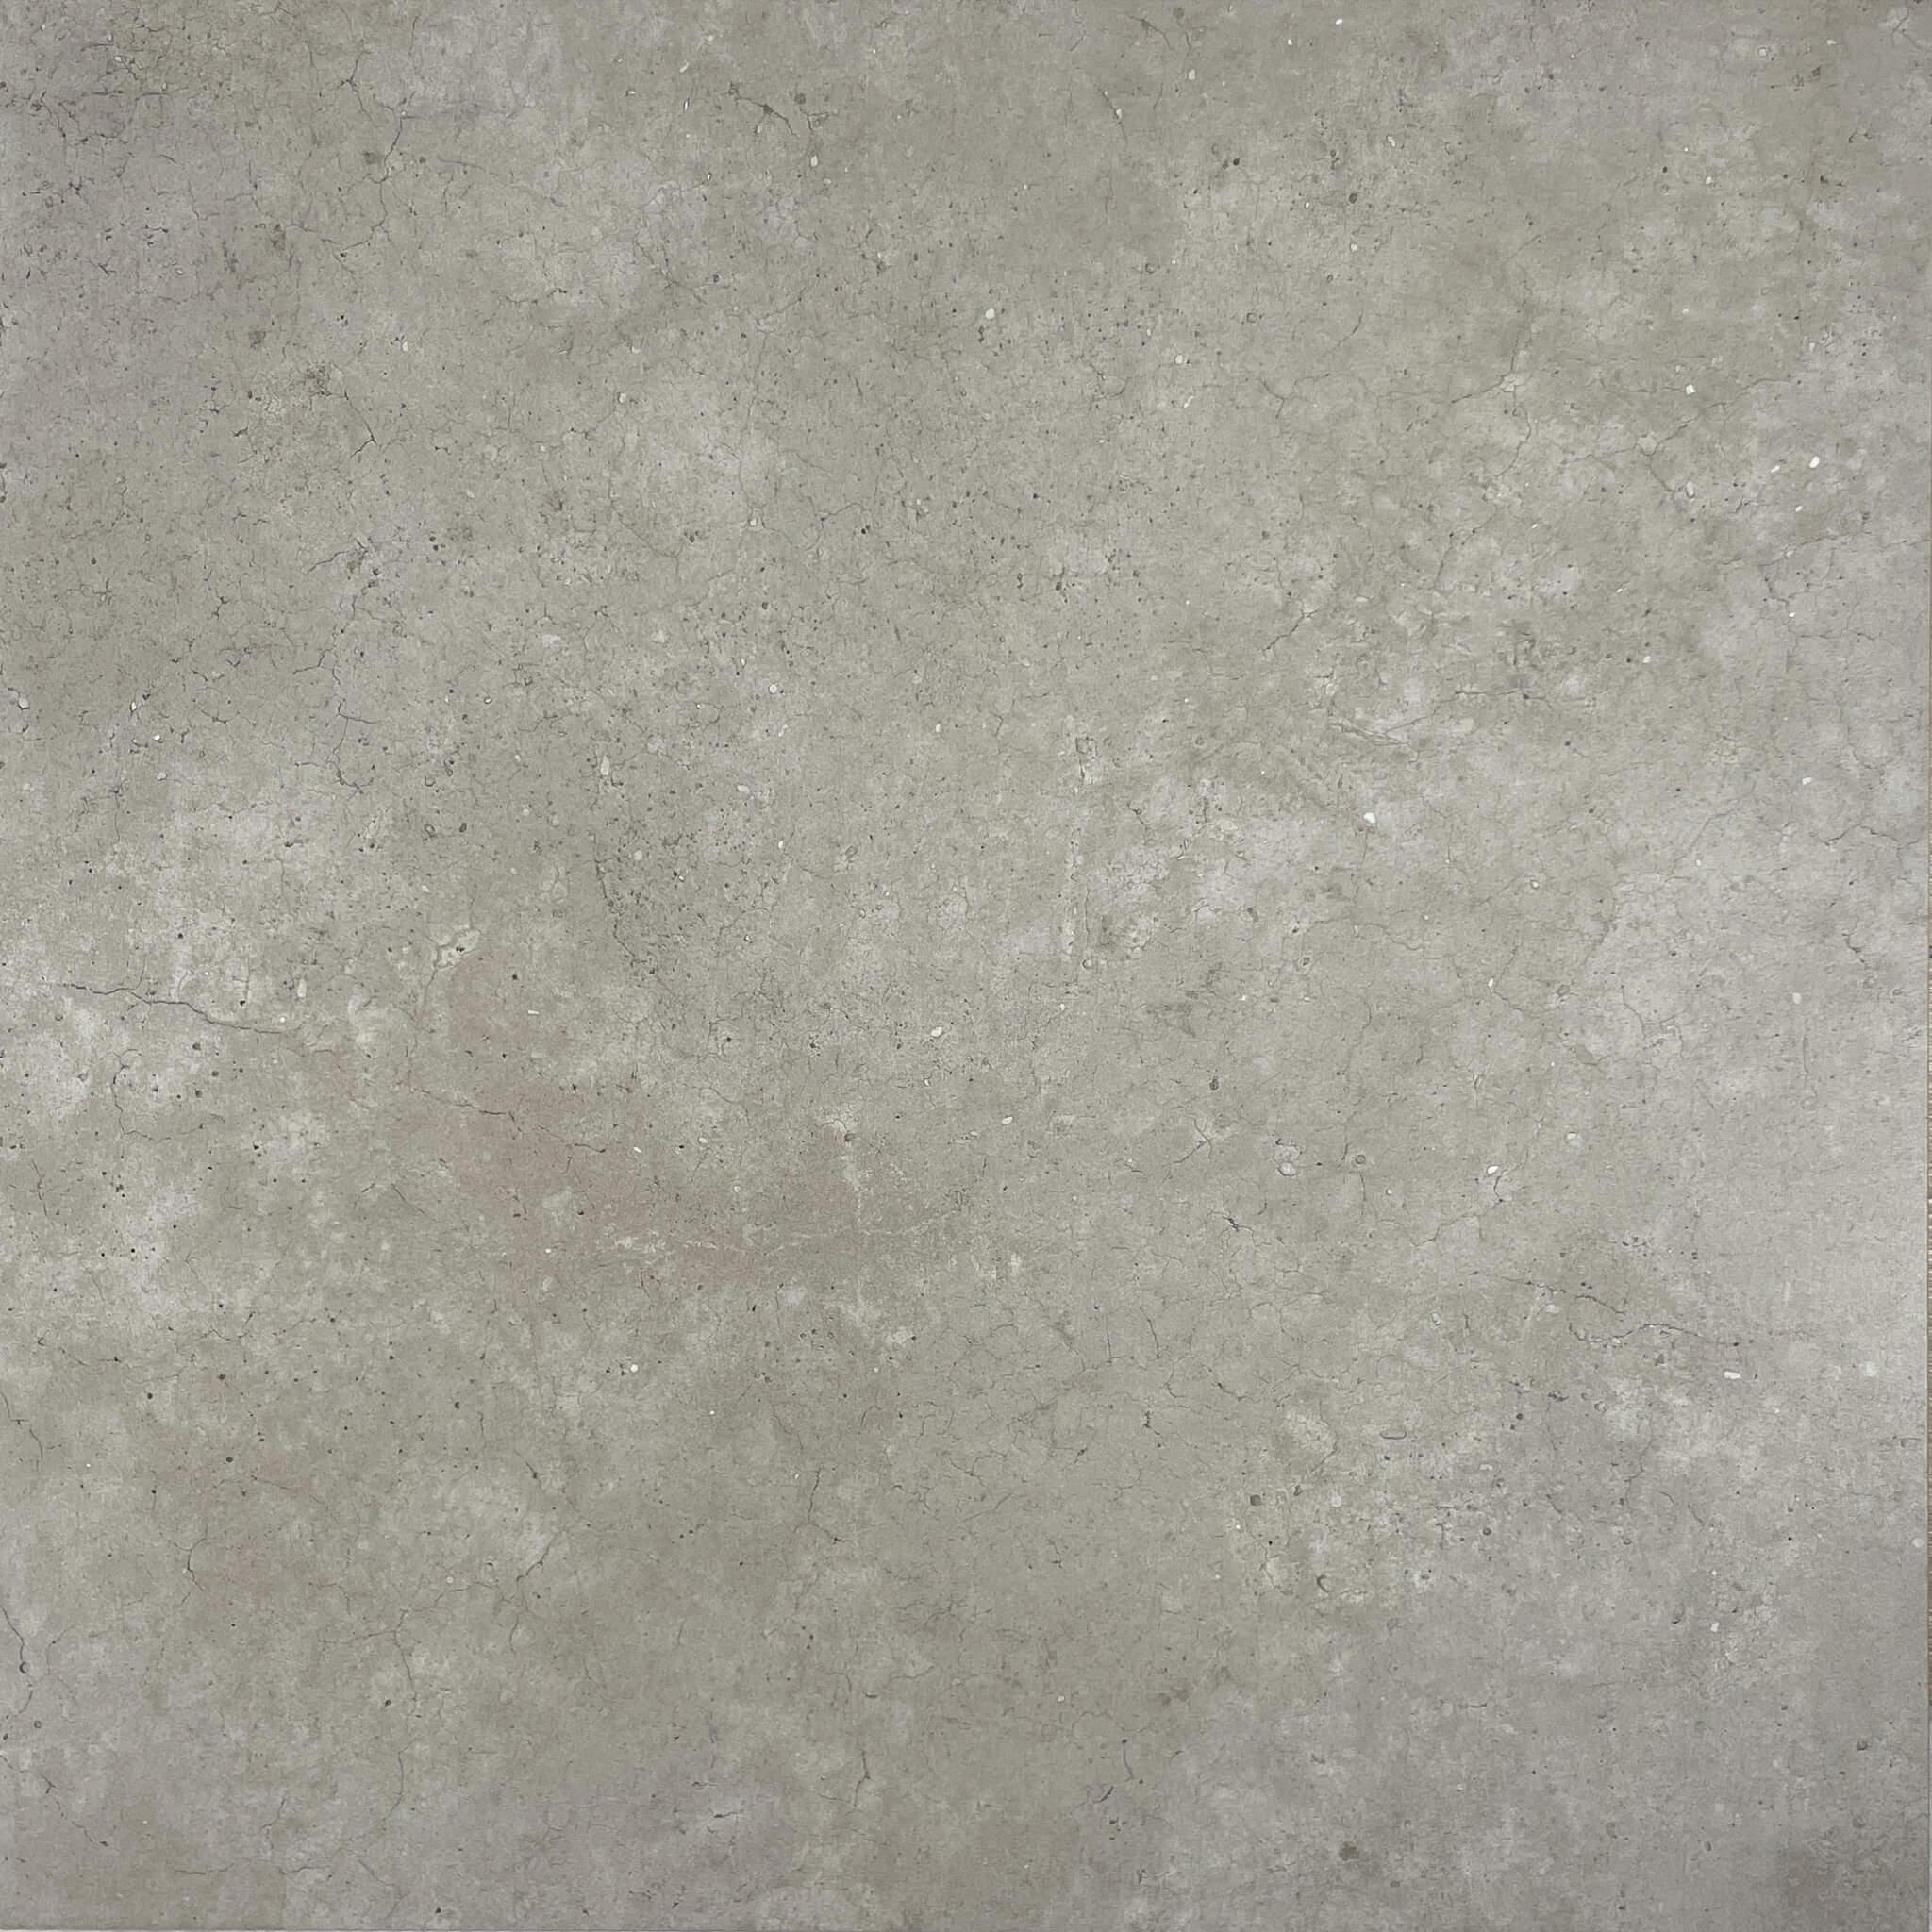 Industrial Silver Concrete Look Matt Finish Rectified Italian Porcelain Tile 3916